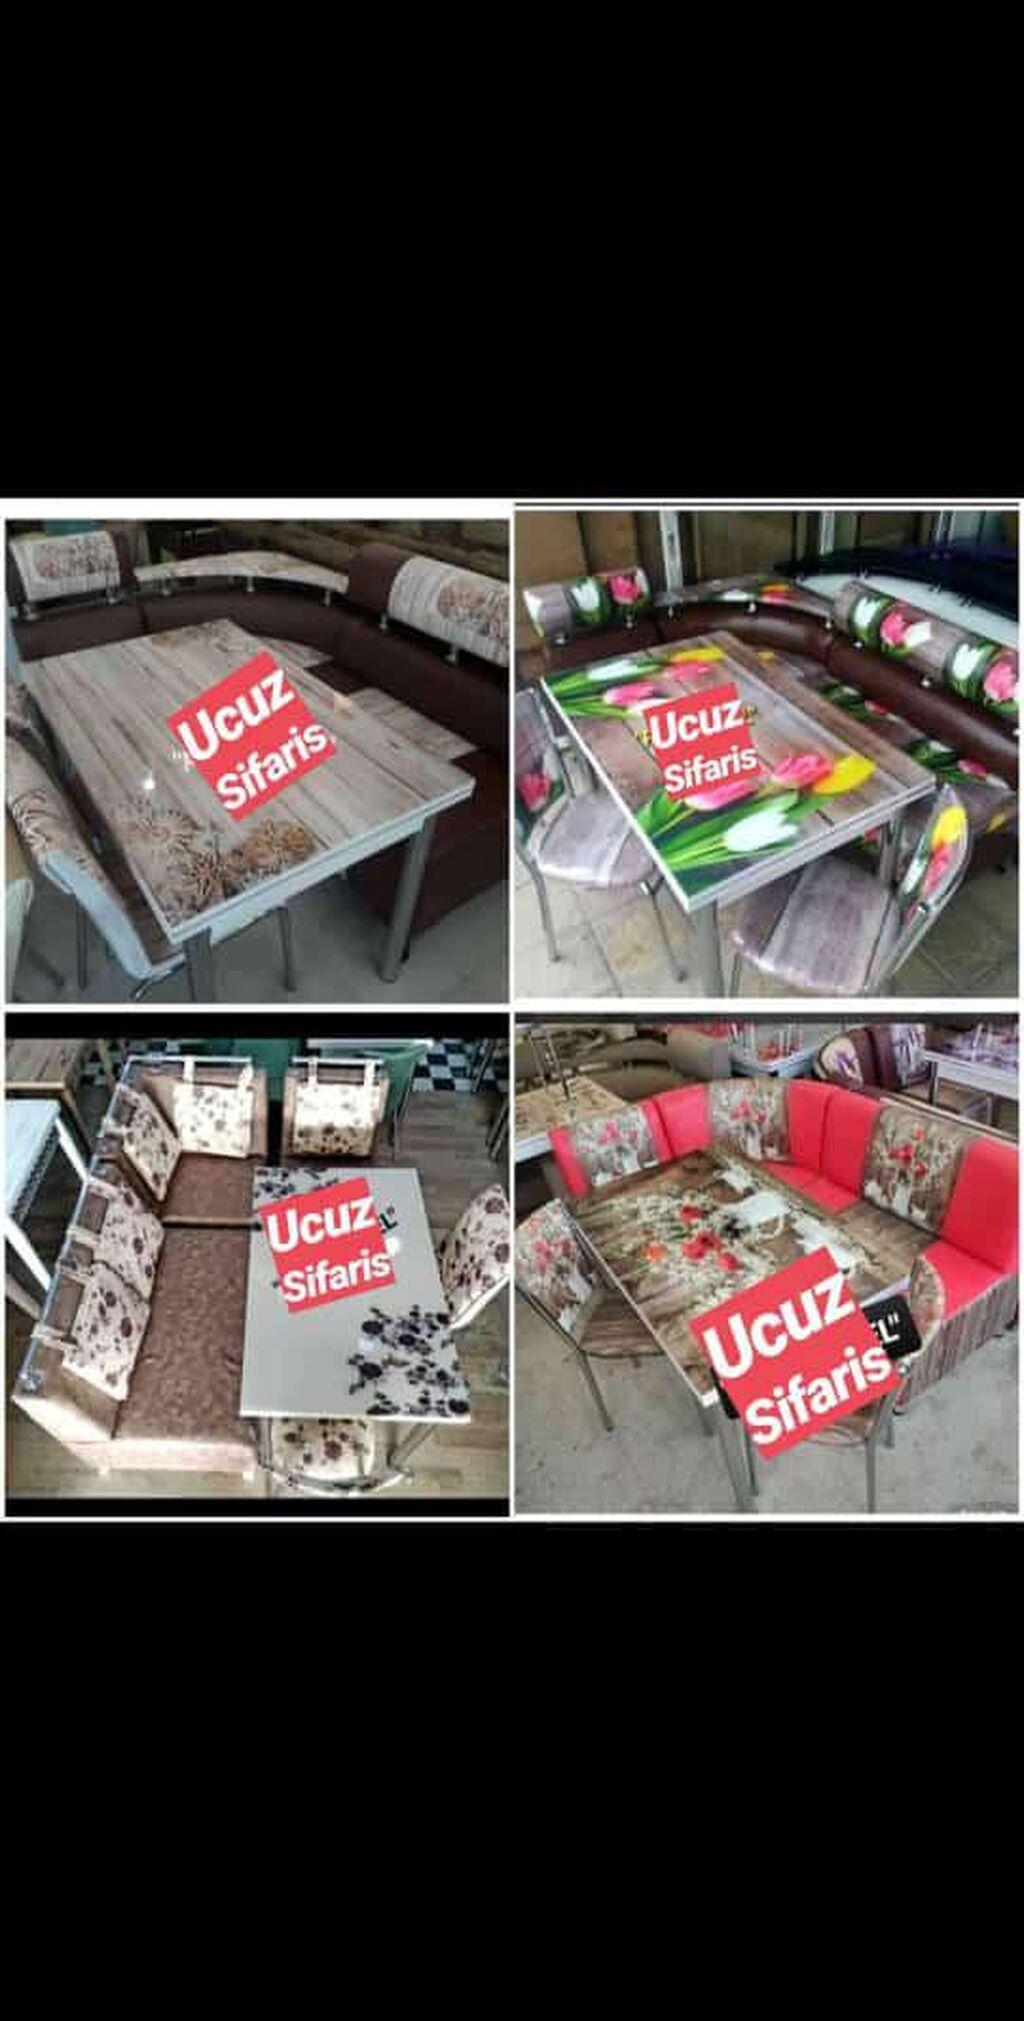 Turkiye istesali masa destleri reng secimi var divan, acilan masa, 2 stulla satilir 400azn seherdaxili catfirilma var(Guler)